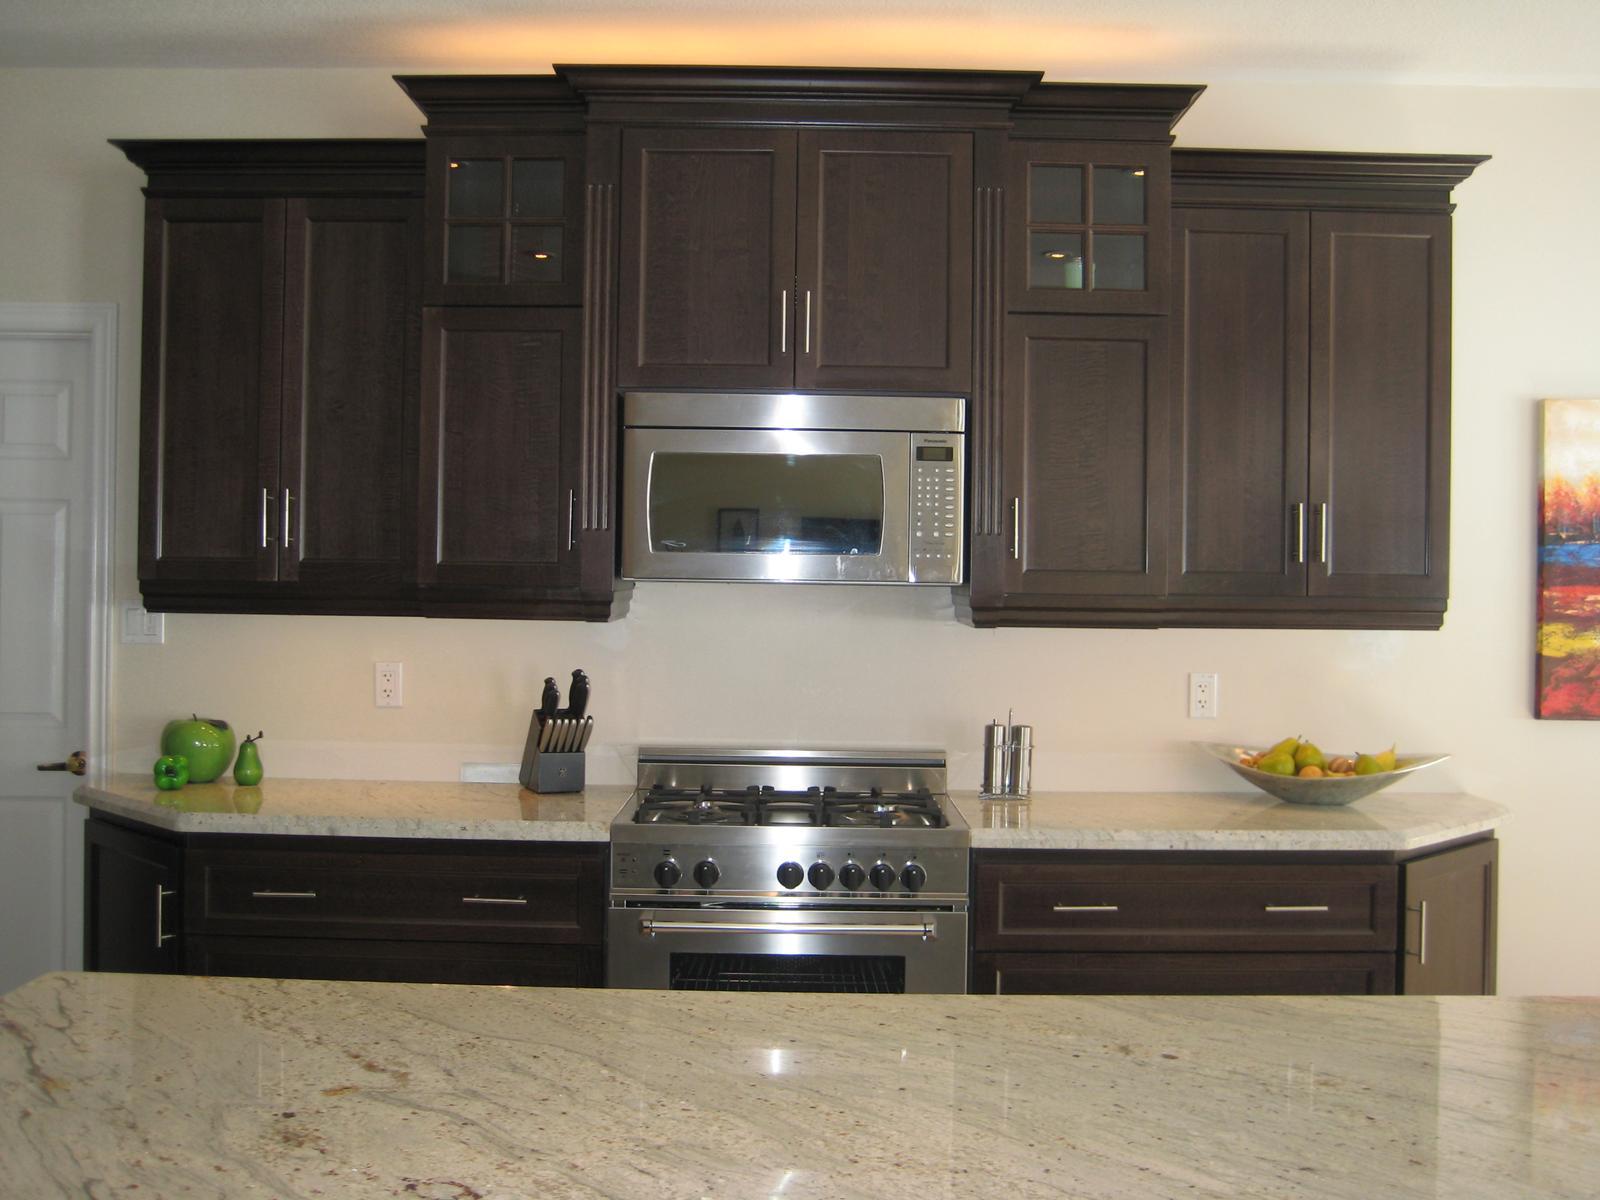 http://4.bp.blogspot.com/_7QZFKuhwBME/TJECvteWkII/AAAAAAAAAIM/Ko_N2KZjXo0/s1600/Kitchen%206%20After.jpg